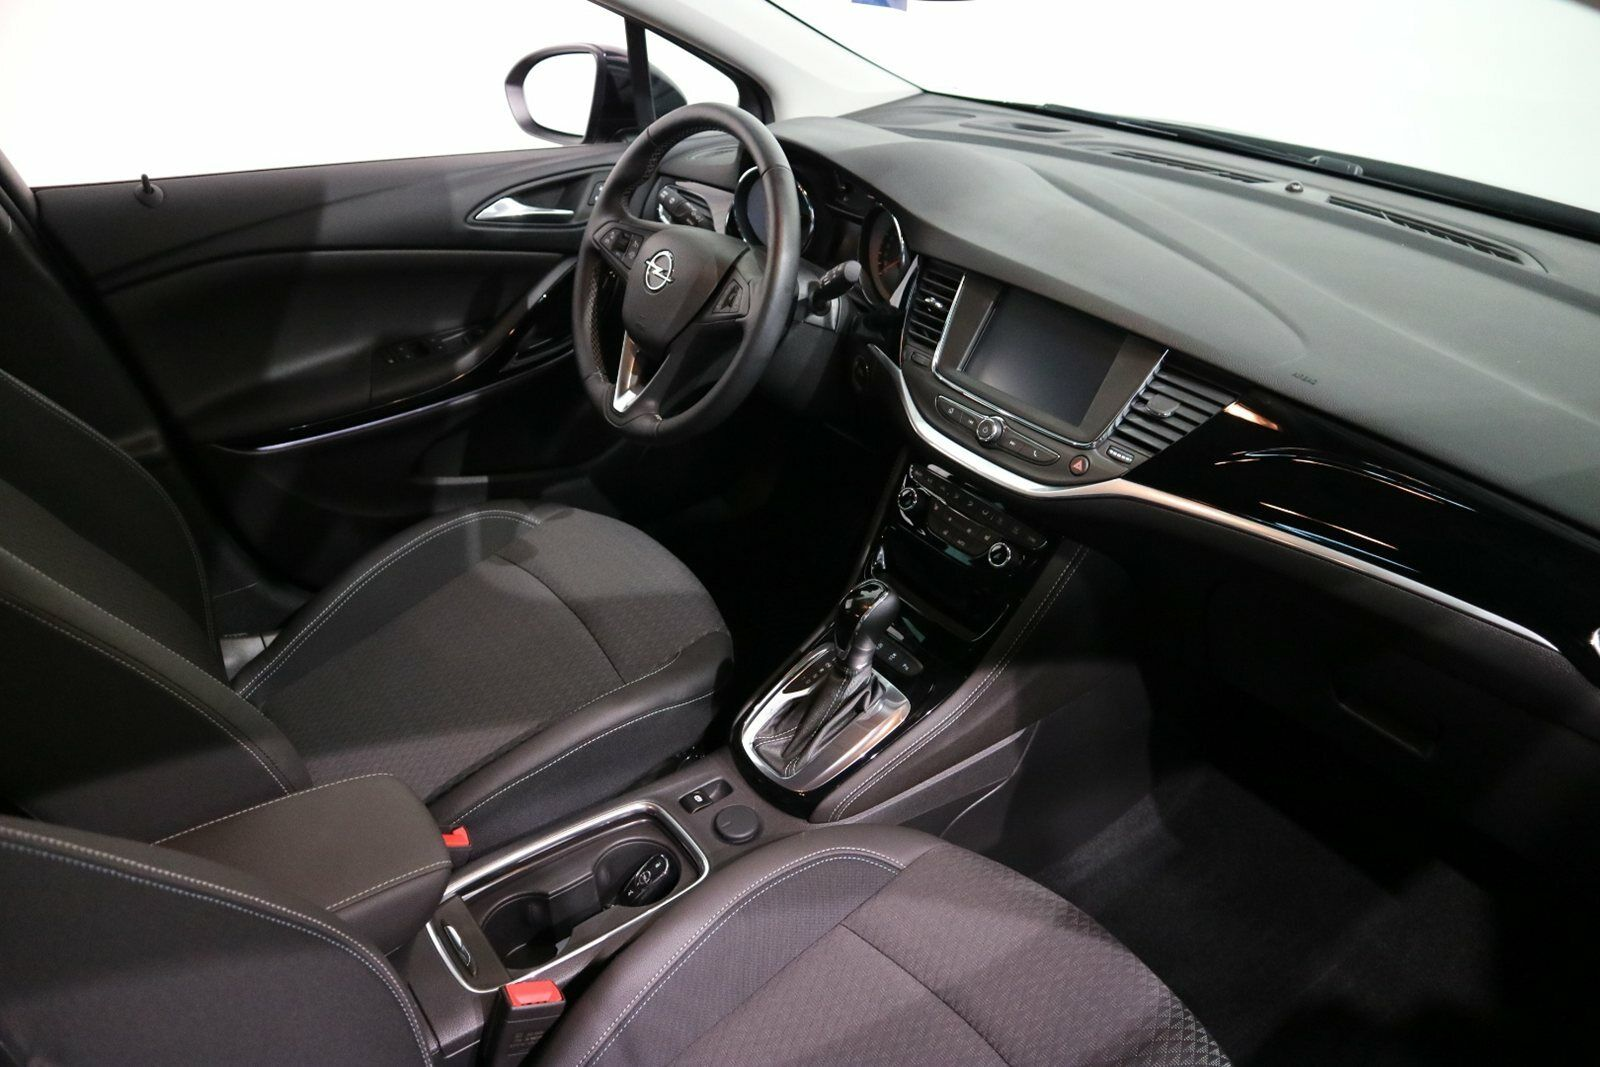 Opel Astra 1,4 T 150 Innovation ST aut. - billede 5